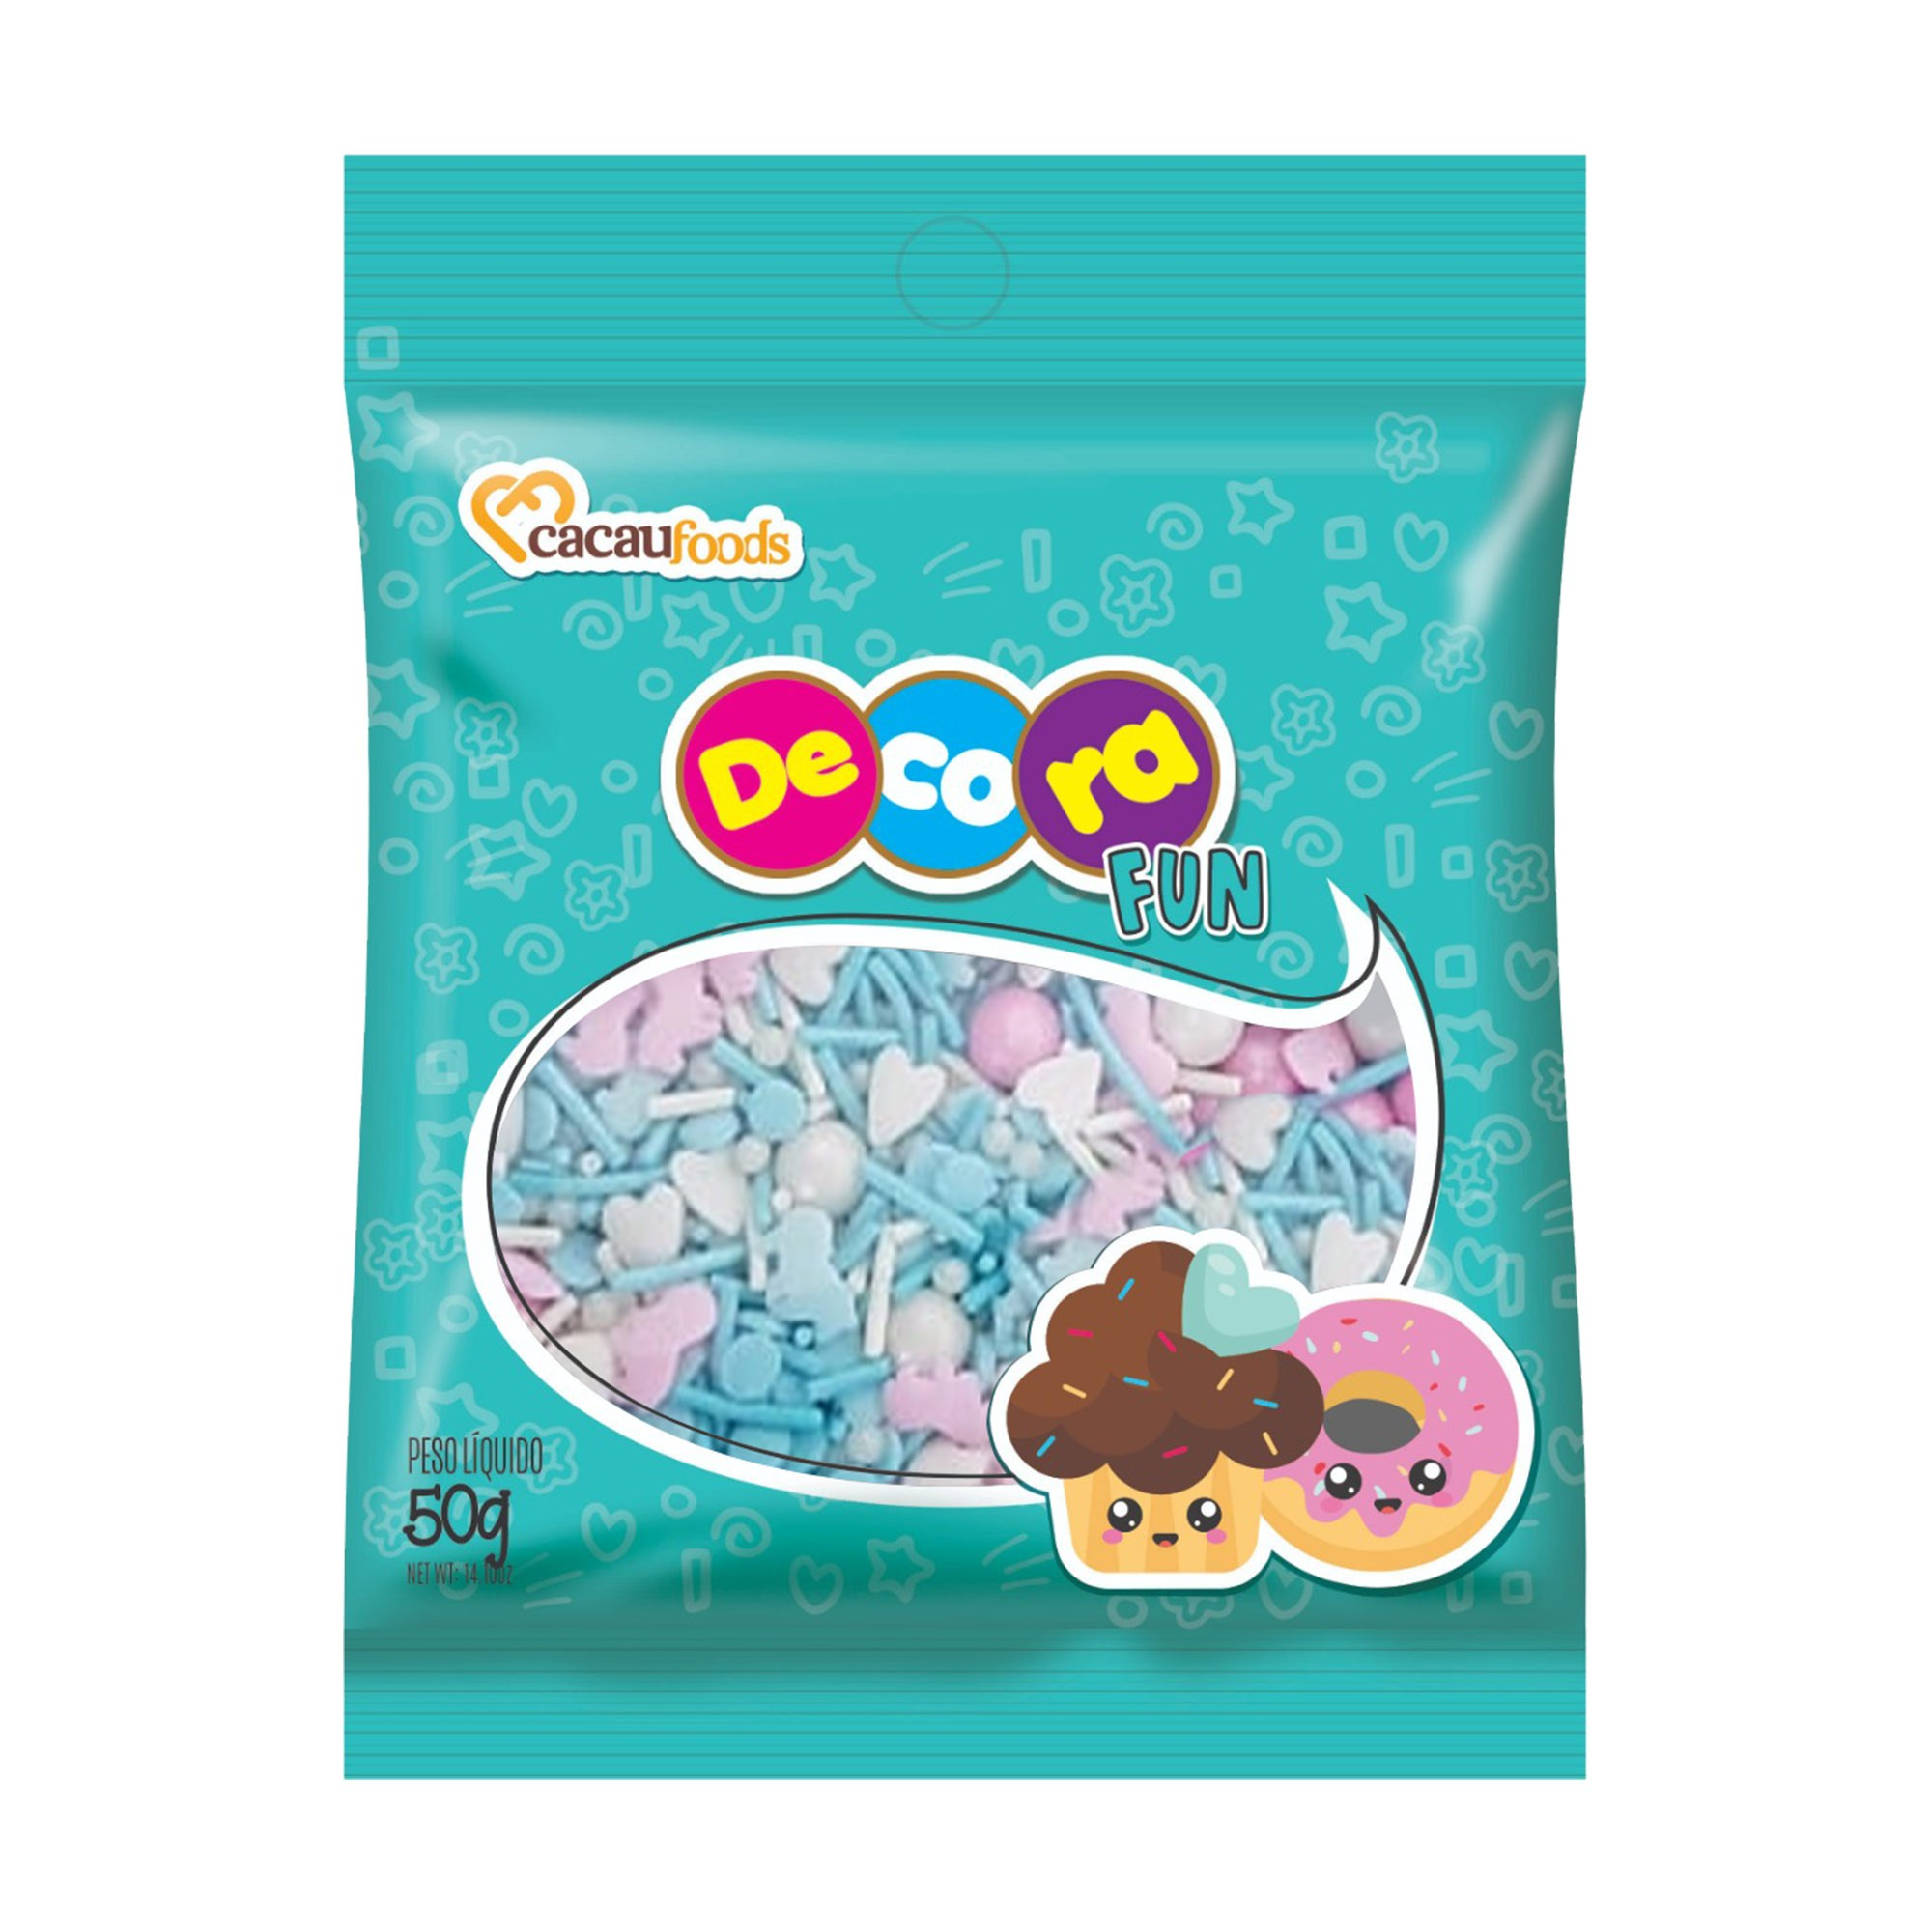 Decora Fun Sweet Blue 50g